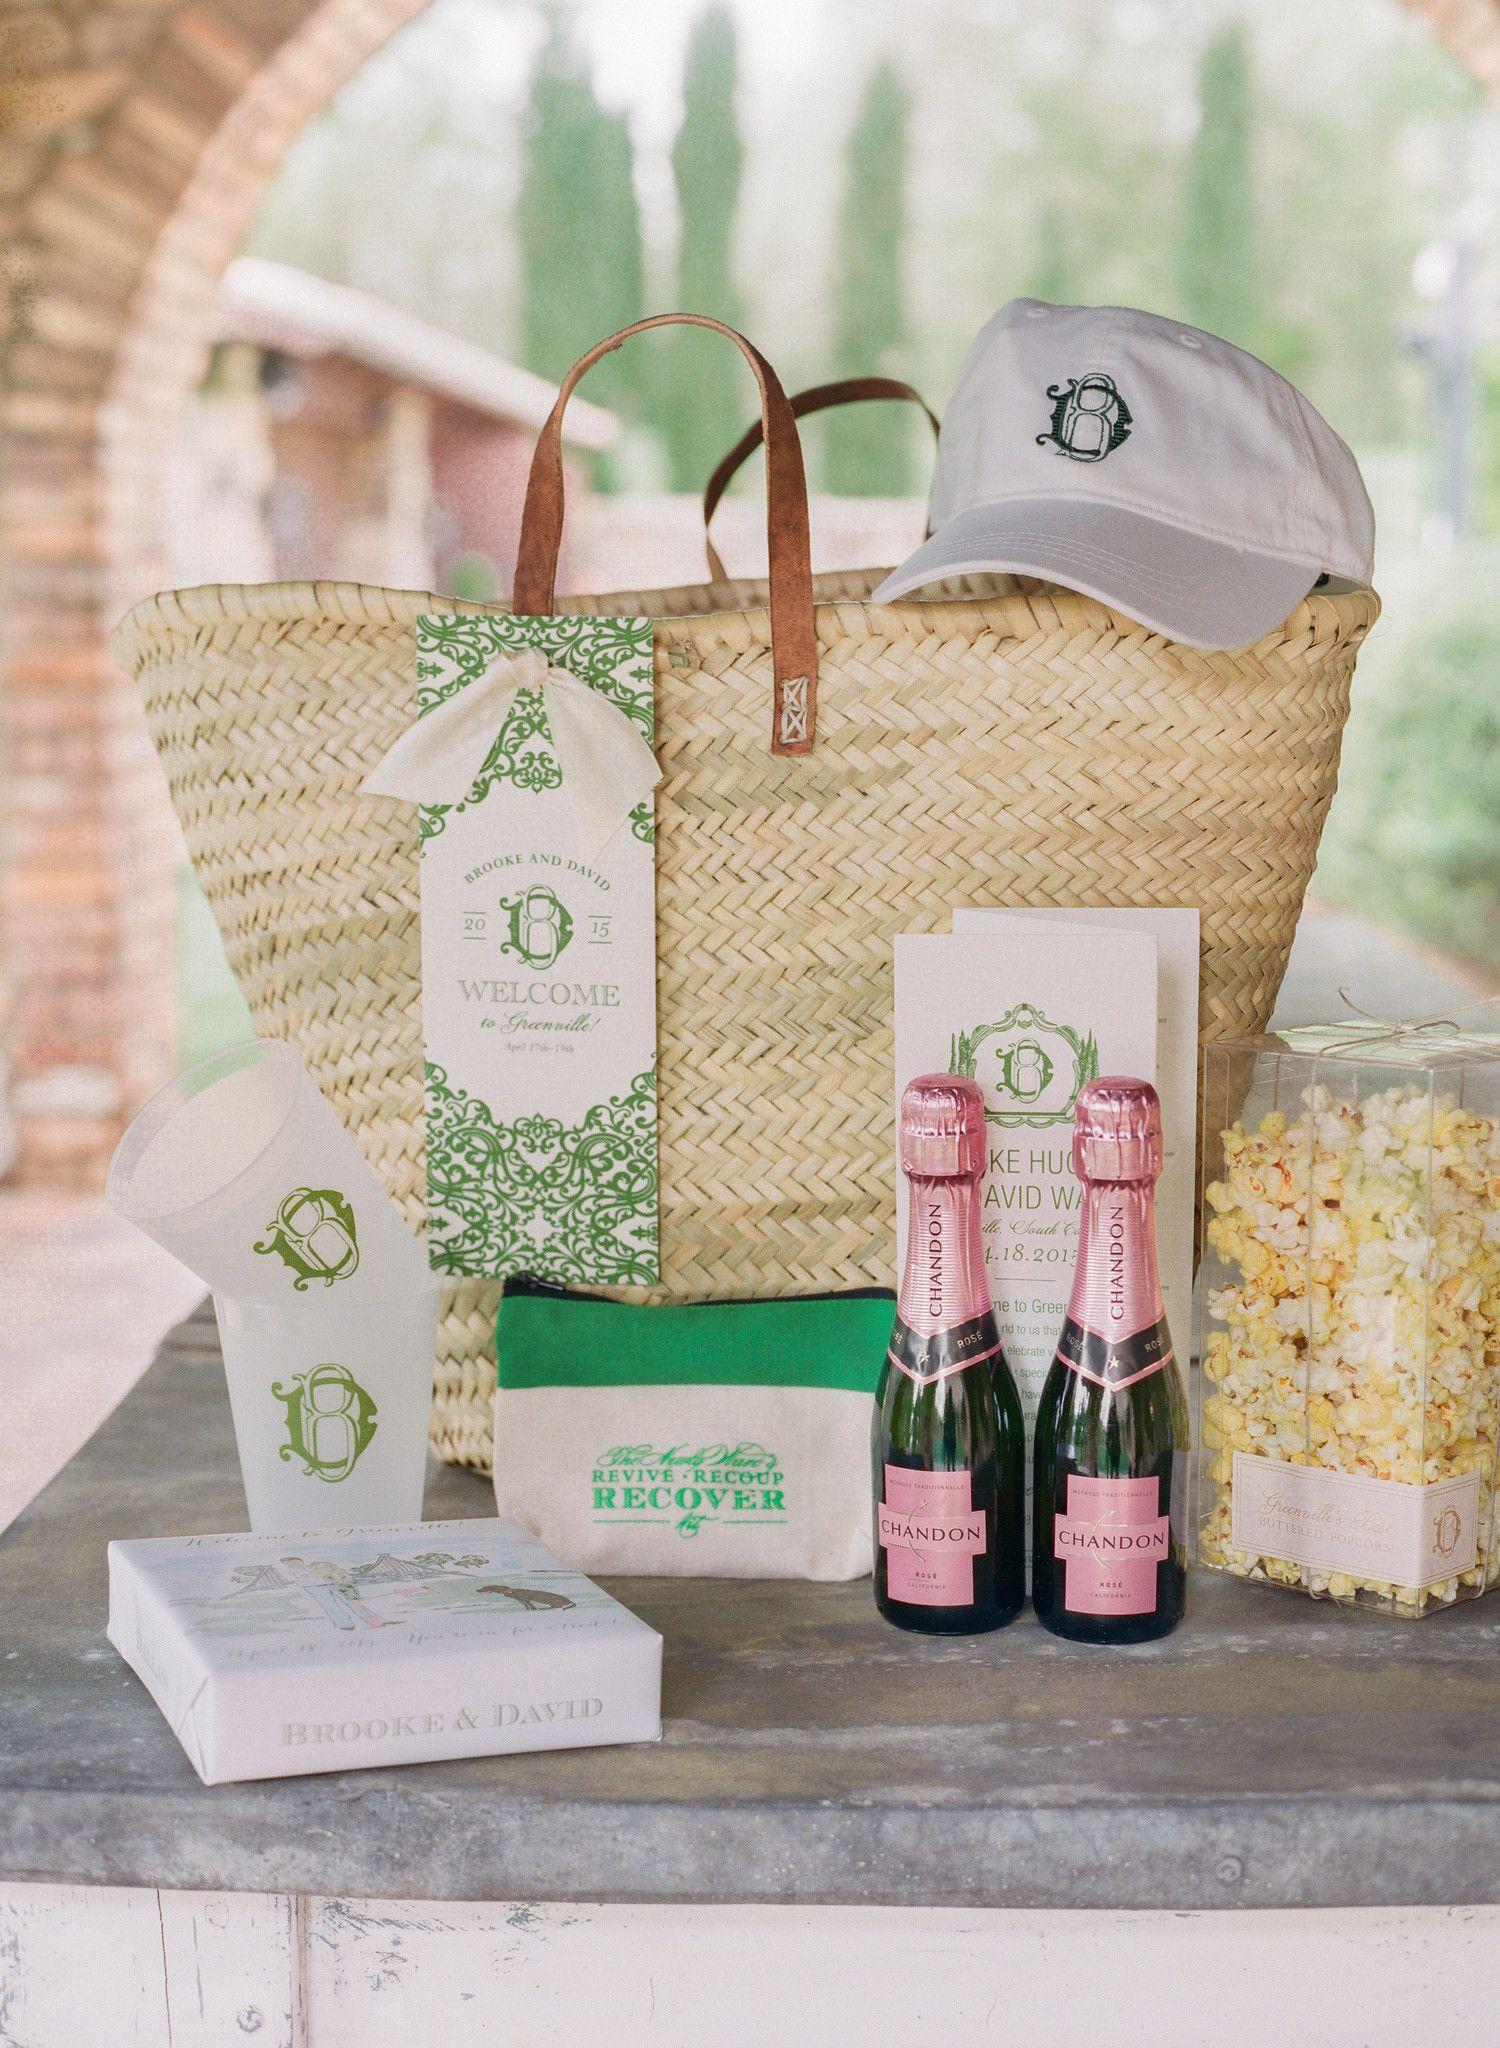 Healthy Ideas For Wedding Welcome Baskets | POPSUGAR Fitness